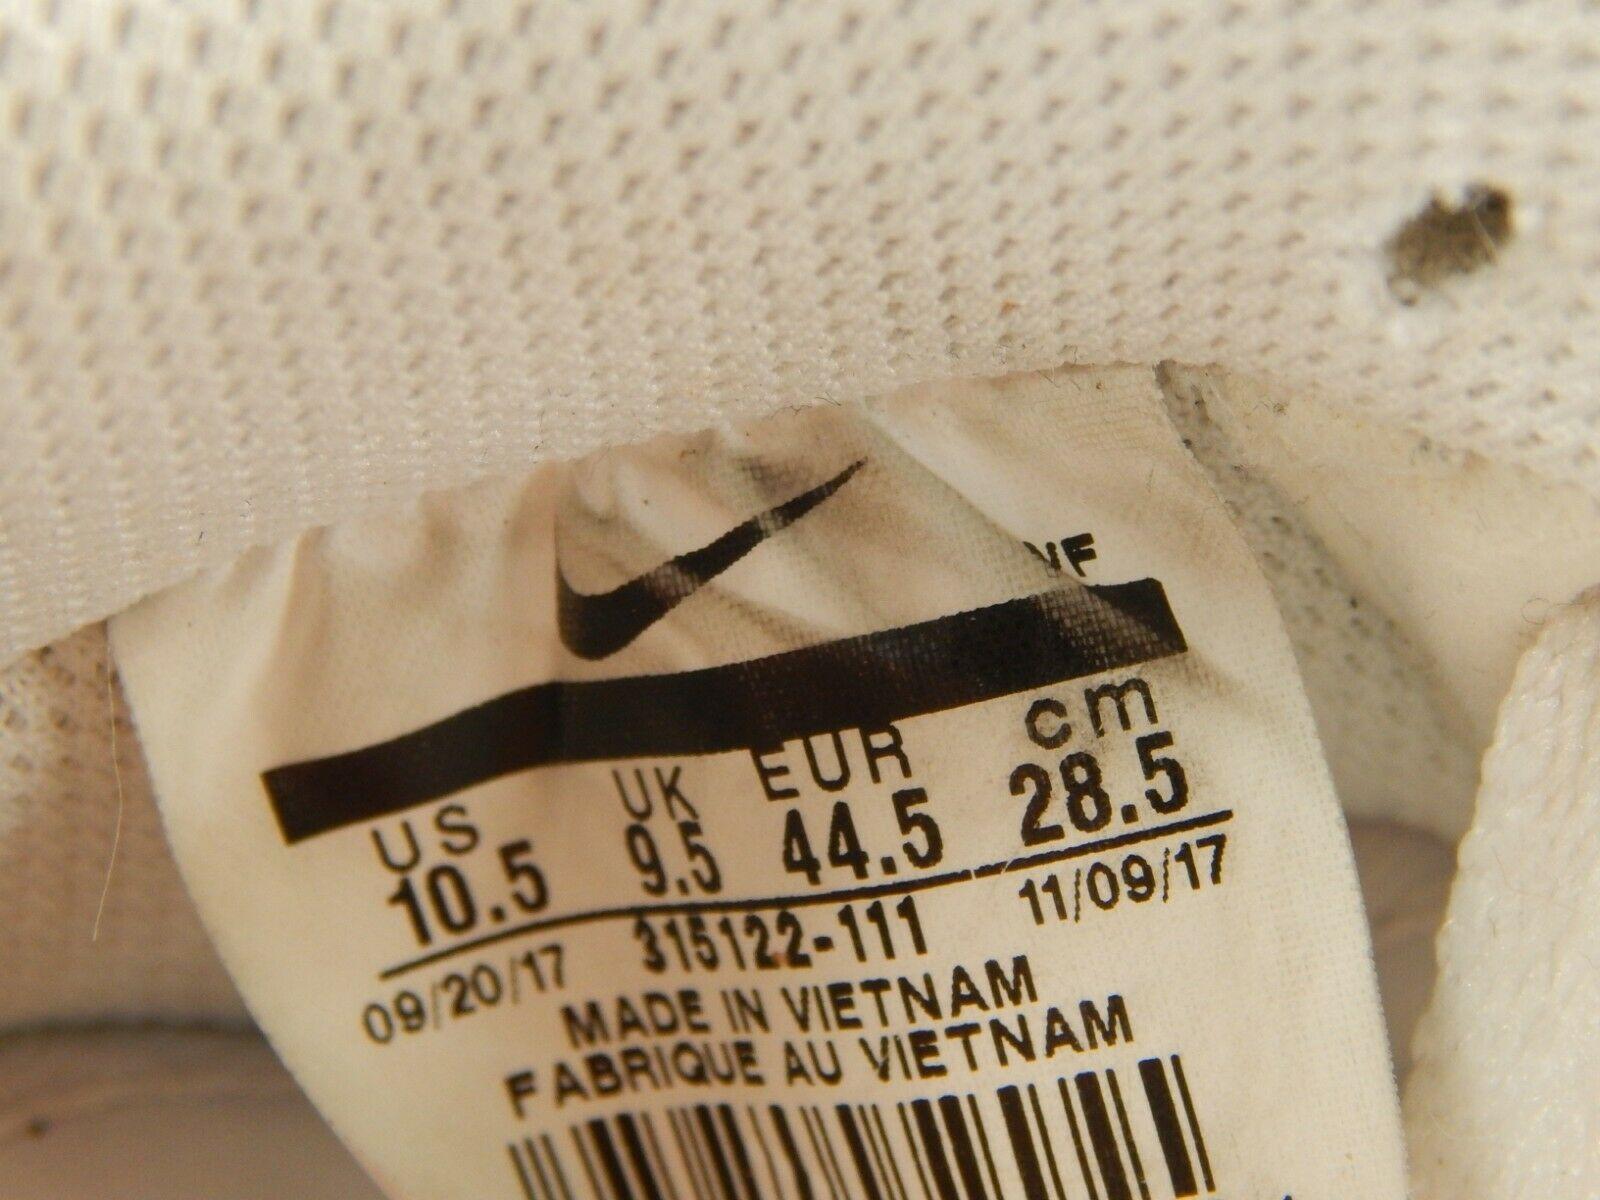 Nike Aeronautica 0.3m07 Taglia 10.5 M (D) Eu 44.5 Uomo Scarpe da Tennis